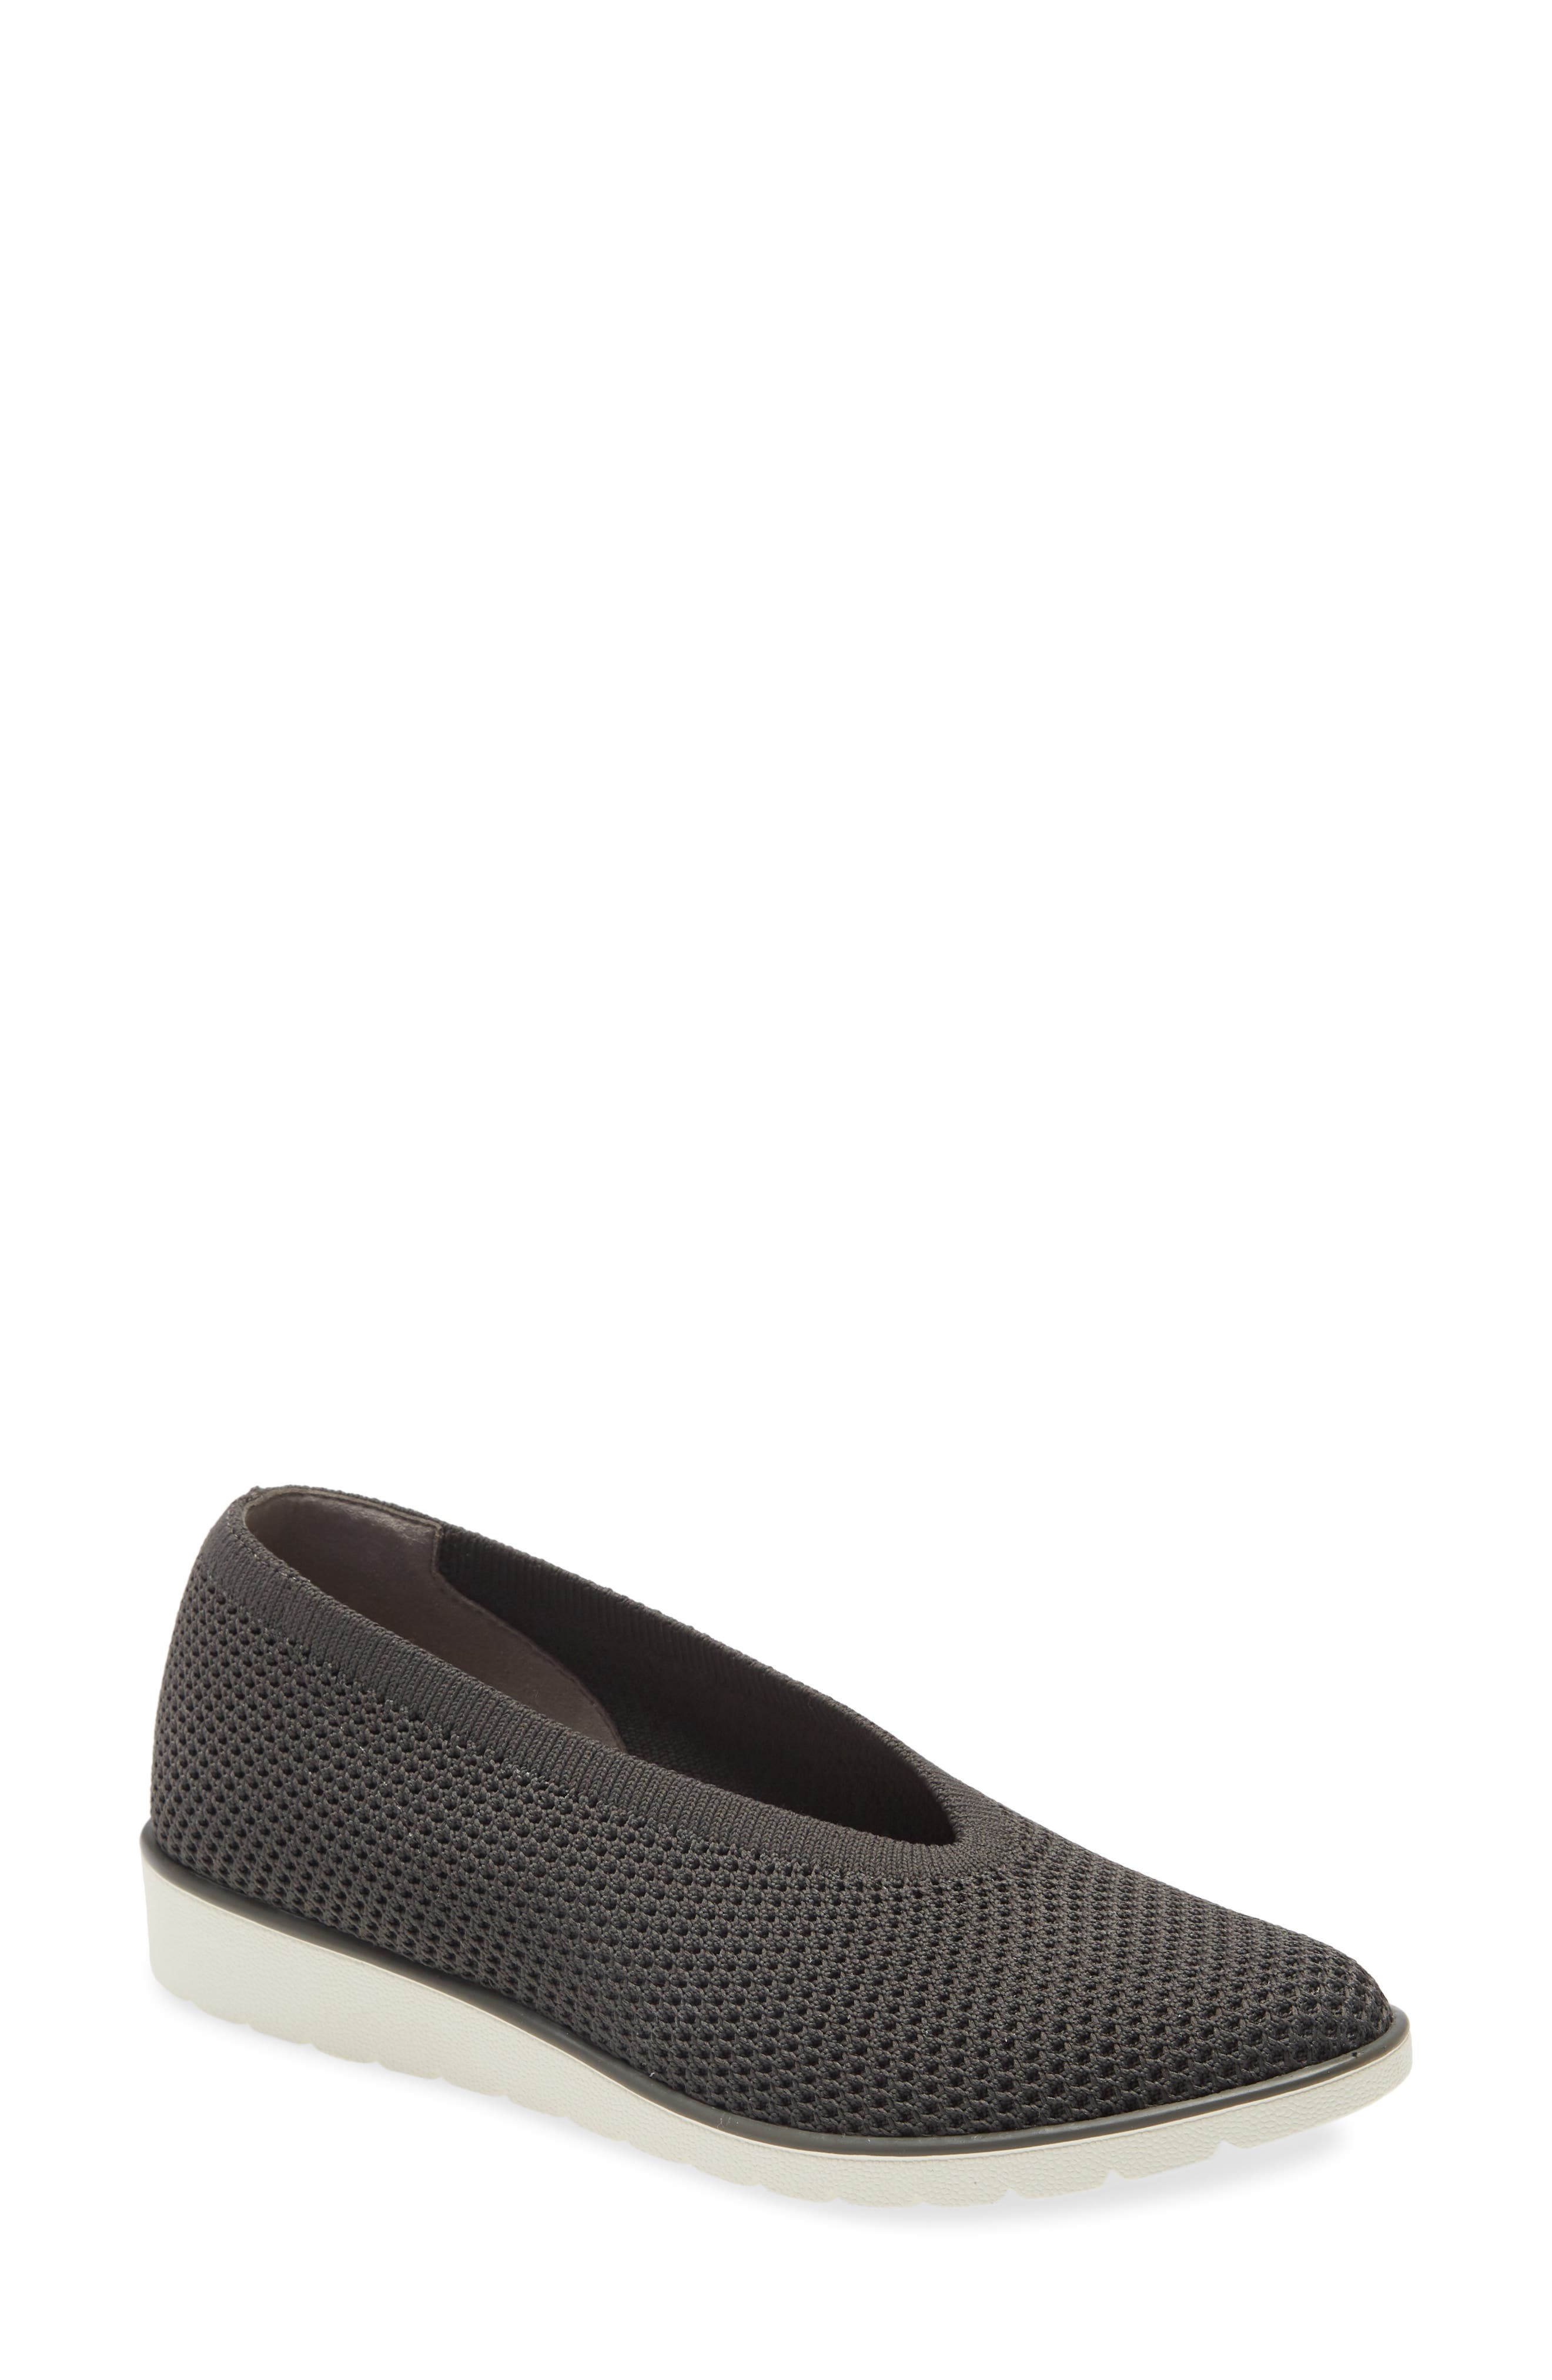 Women's Eileen Fisher Shoes | Nordstrom